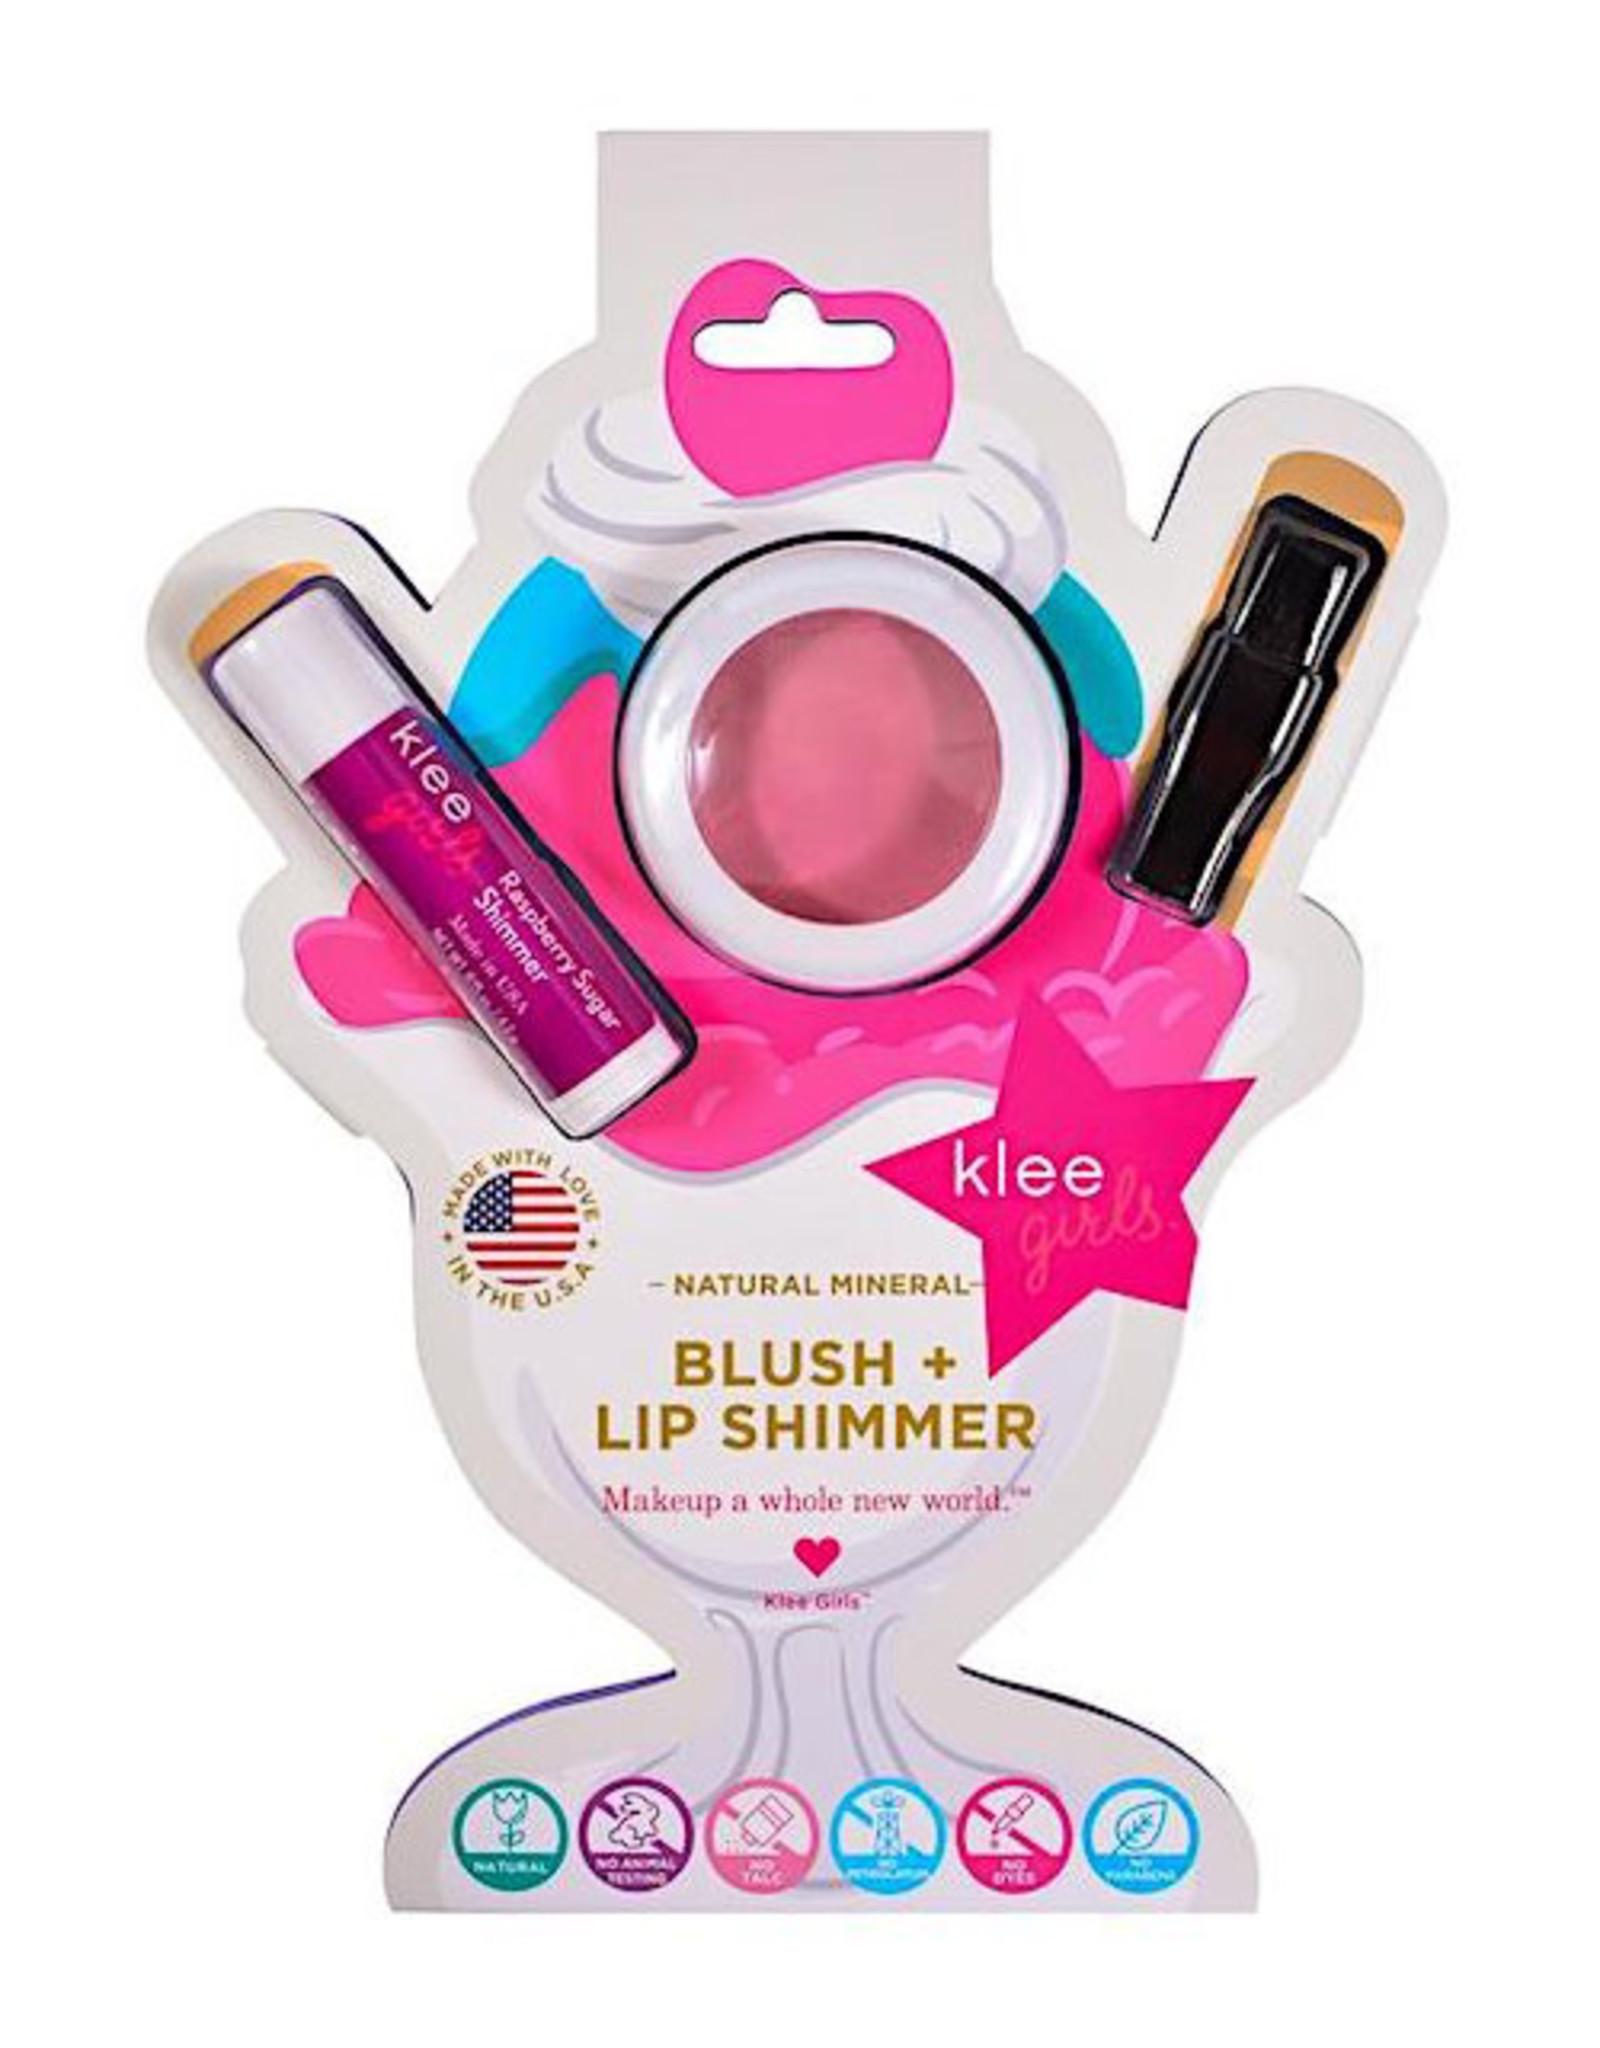 Klee Klee Blush and Lip Shimmer